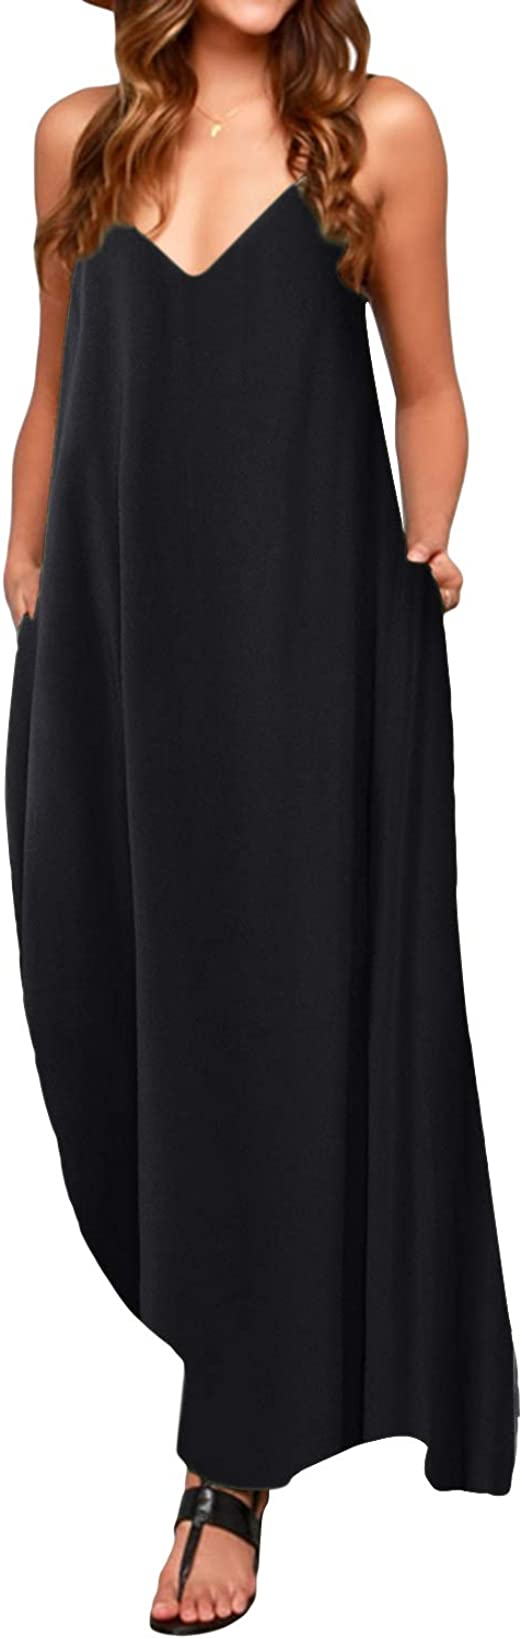 TALLA L. ACHIOOWA Mujer Vestido Elegante Casual Dress Cuello V Sin Manga Playa Tirantes Bolsillos Punto Falda Larga Negro